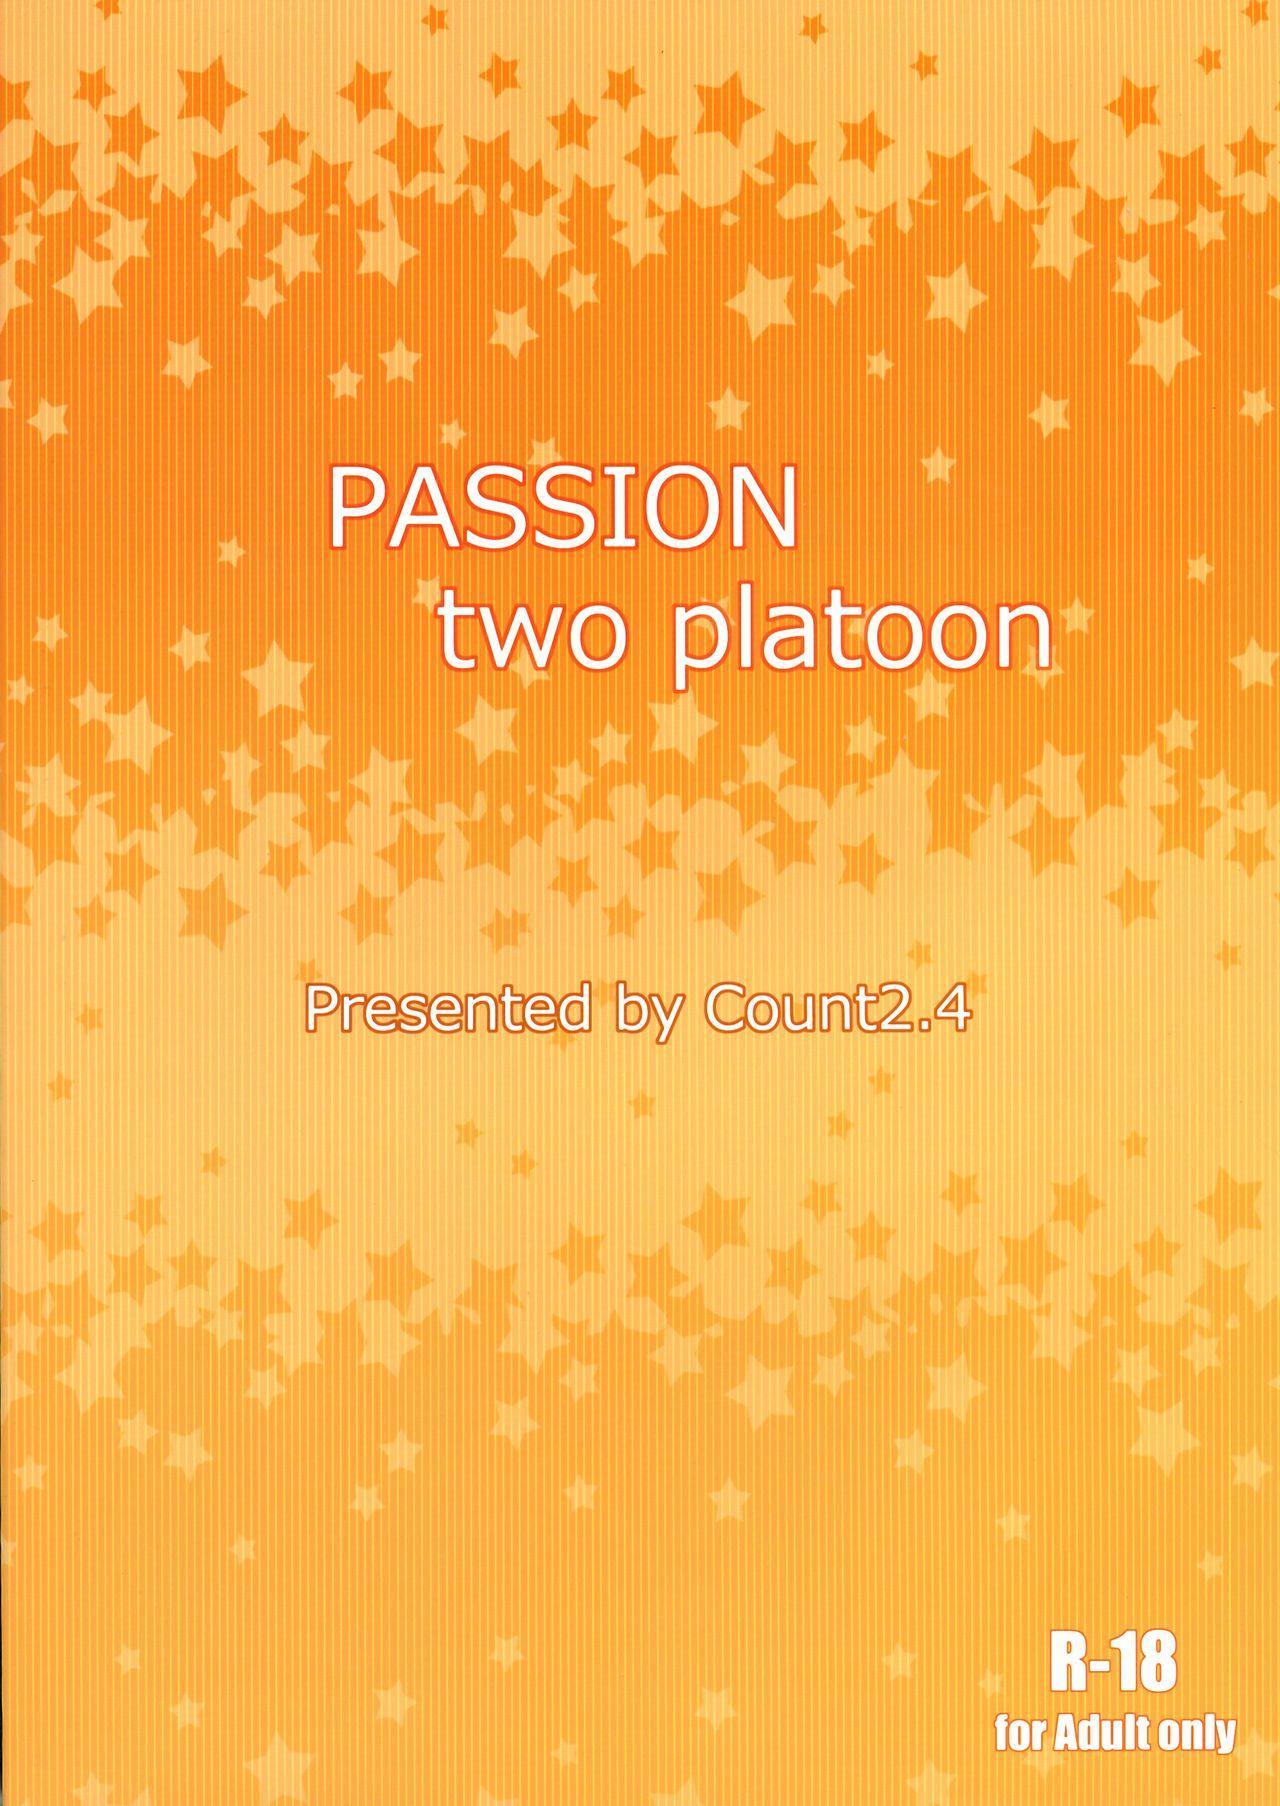 PASSION two platoon 2